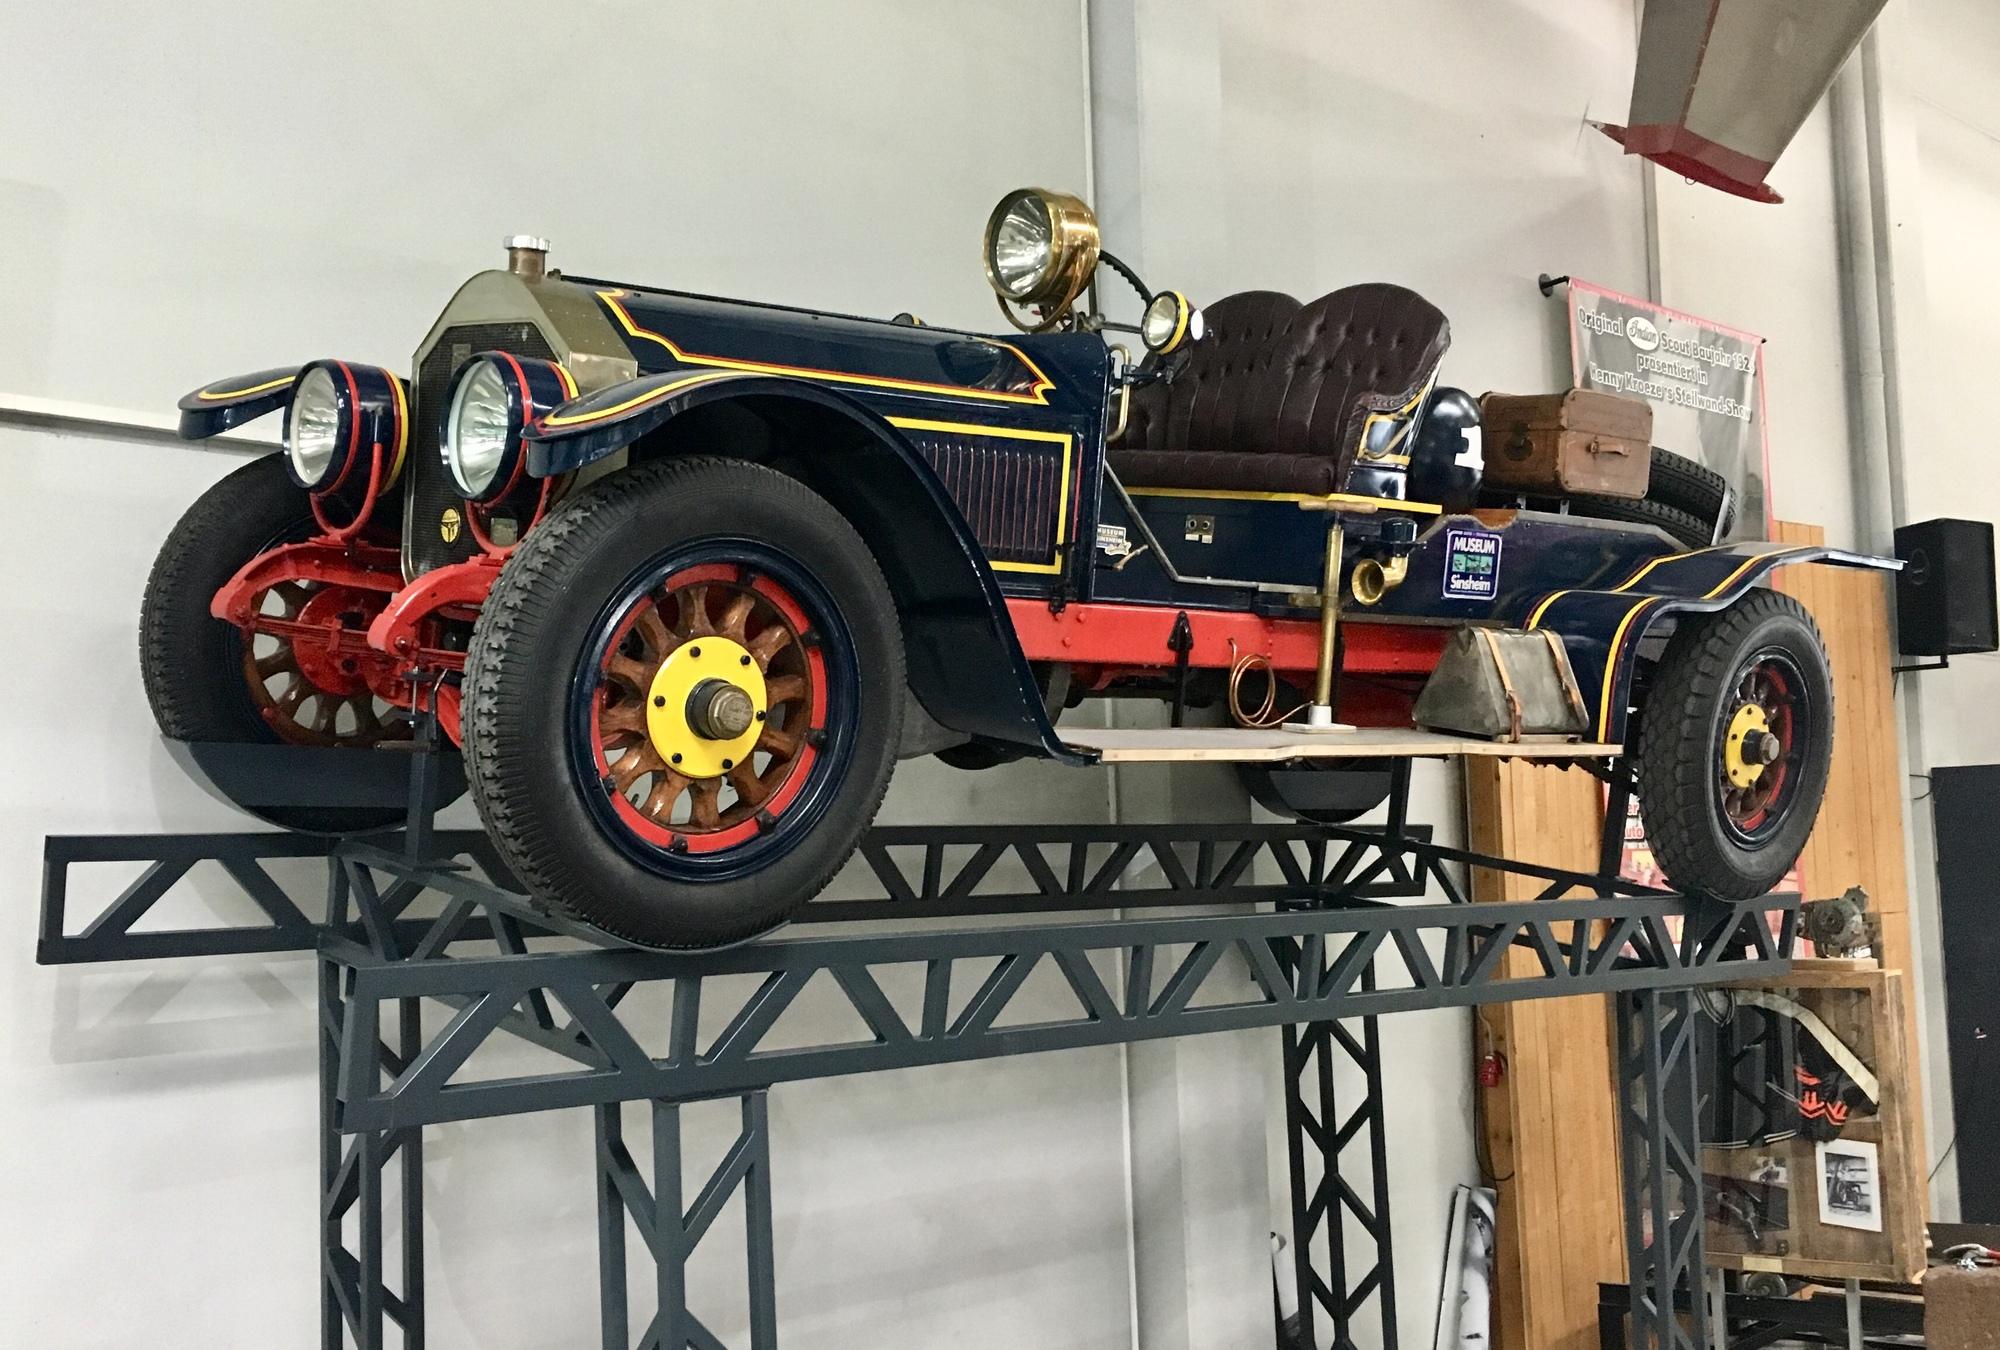 relaunch der american dream cars collection im technik museum sinsheim freizeitpark. Black Bedroom Furniture Sets. Home Design Ideas